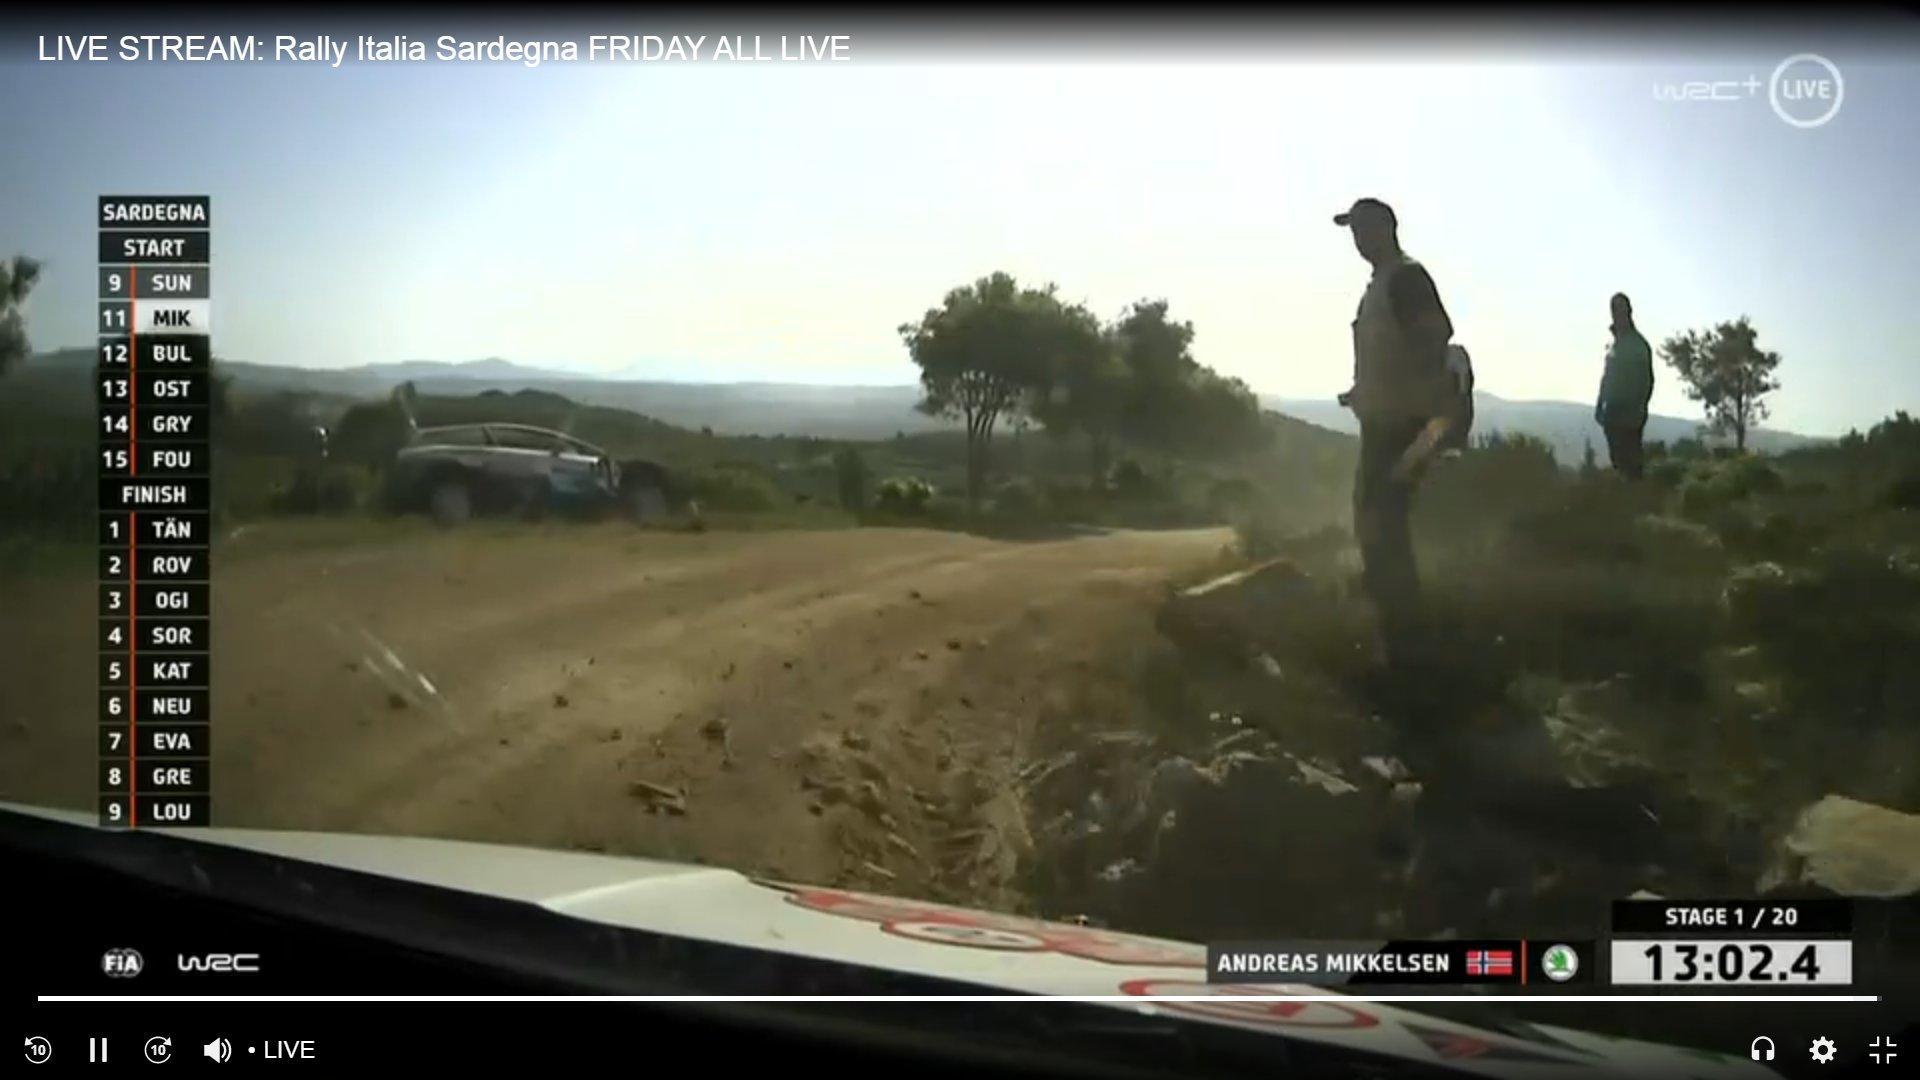 WRC: Rally d'Italia - Sardegna [3-6 Junio] - Página 2 E3BOAqaXEAITSXc?format=jpg&name=large